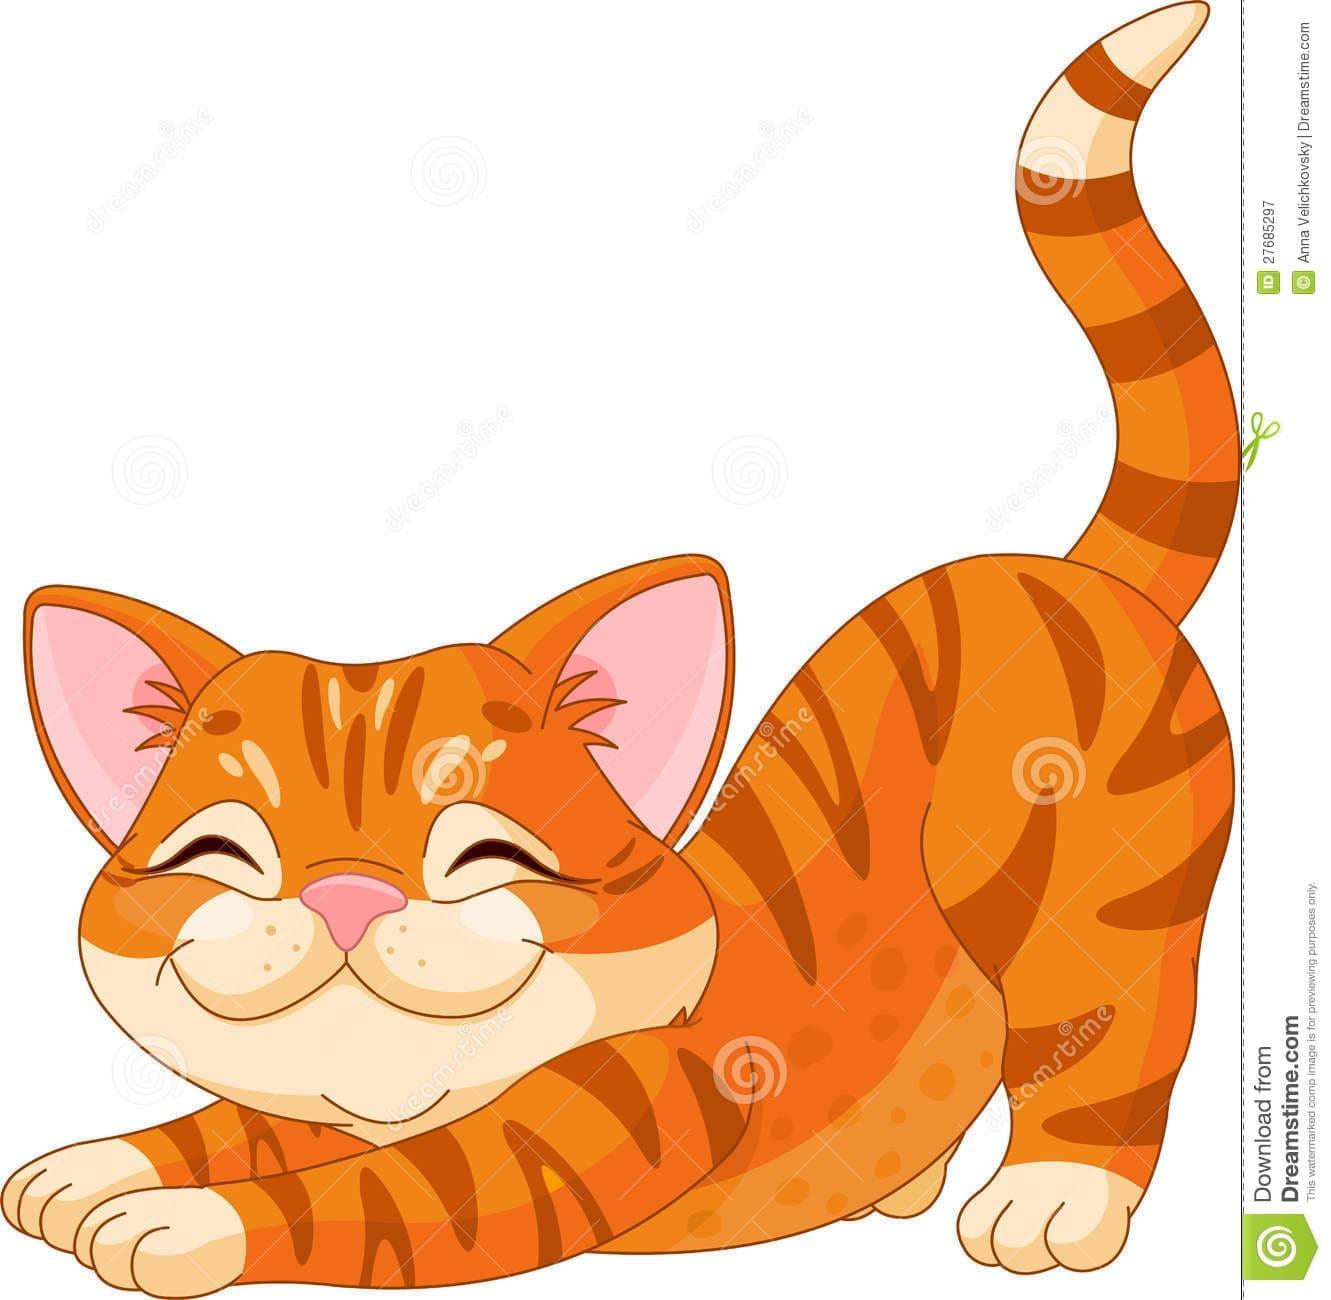 Tumblr dívka kočička